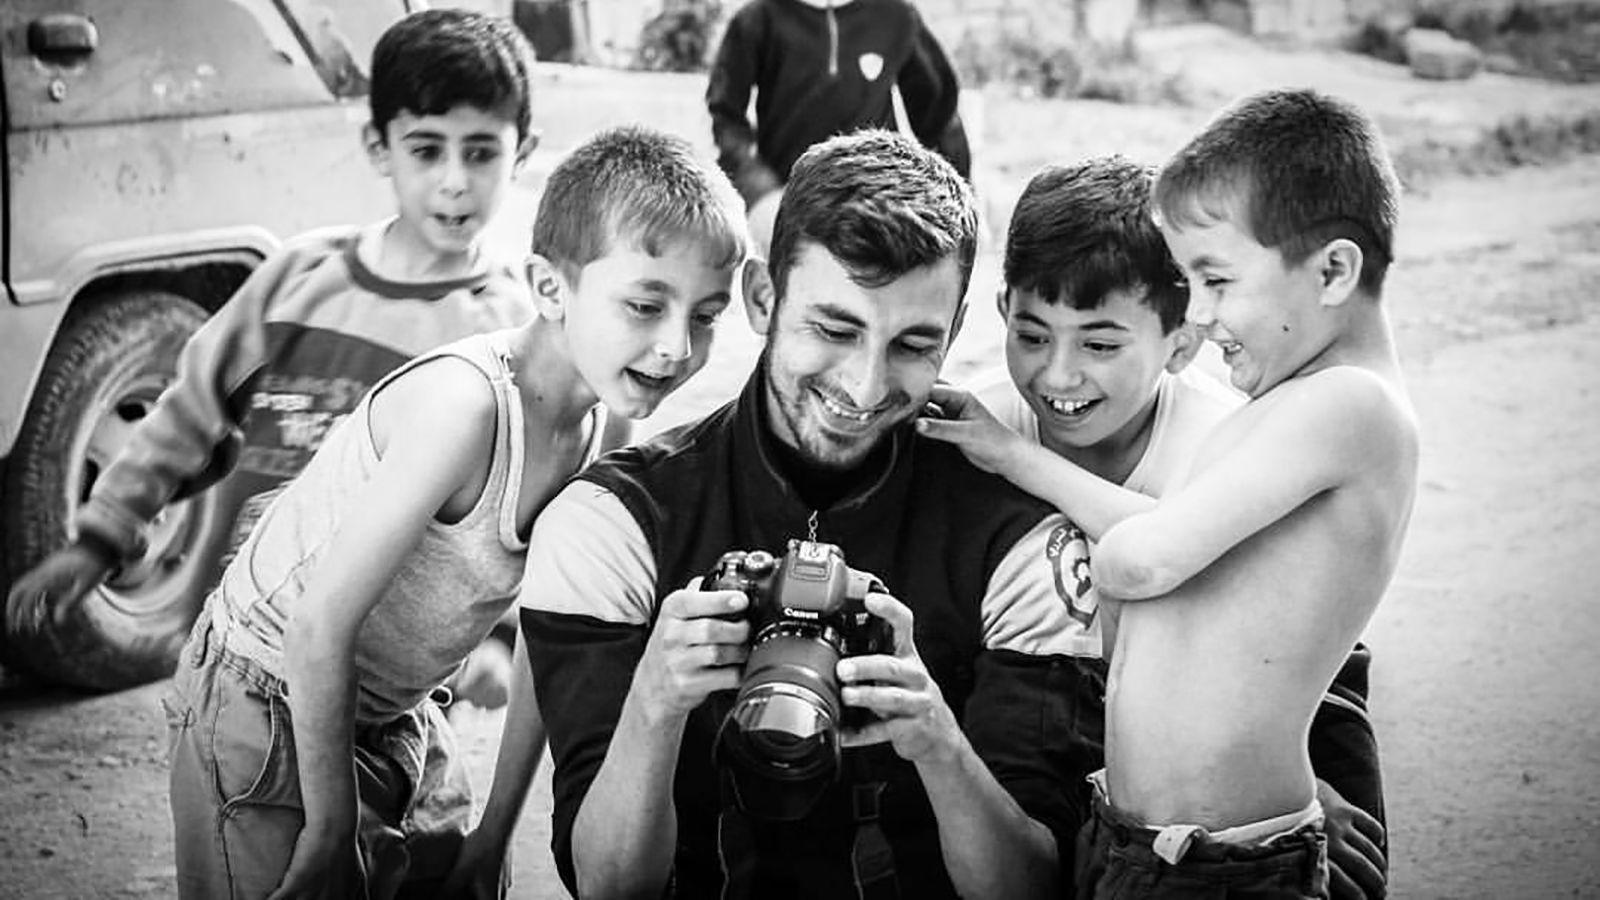 Remembering photographer Anas al-Dyab